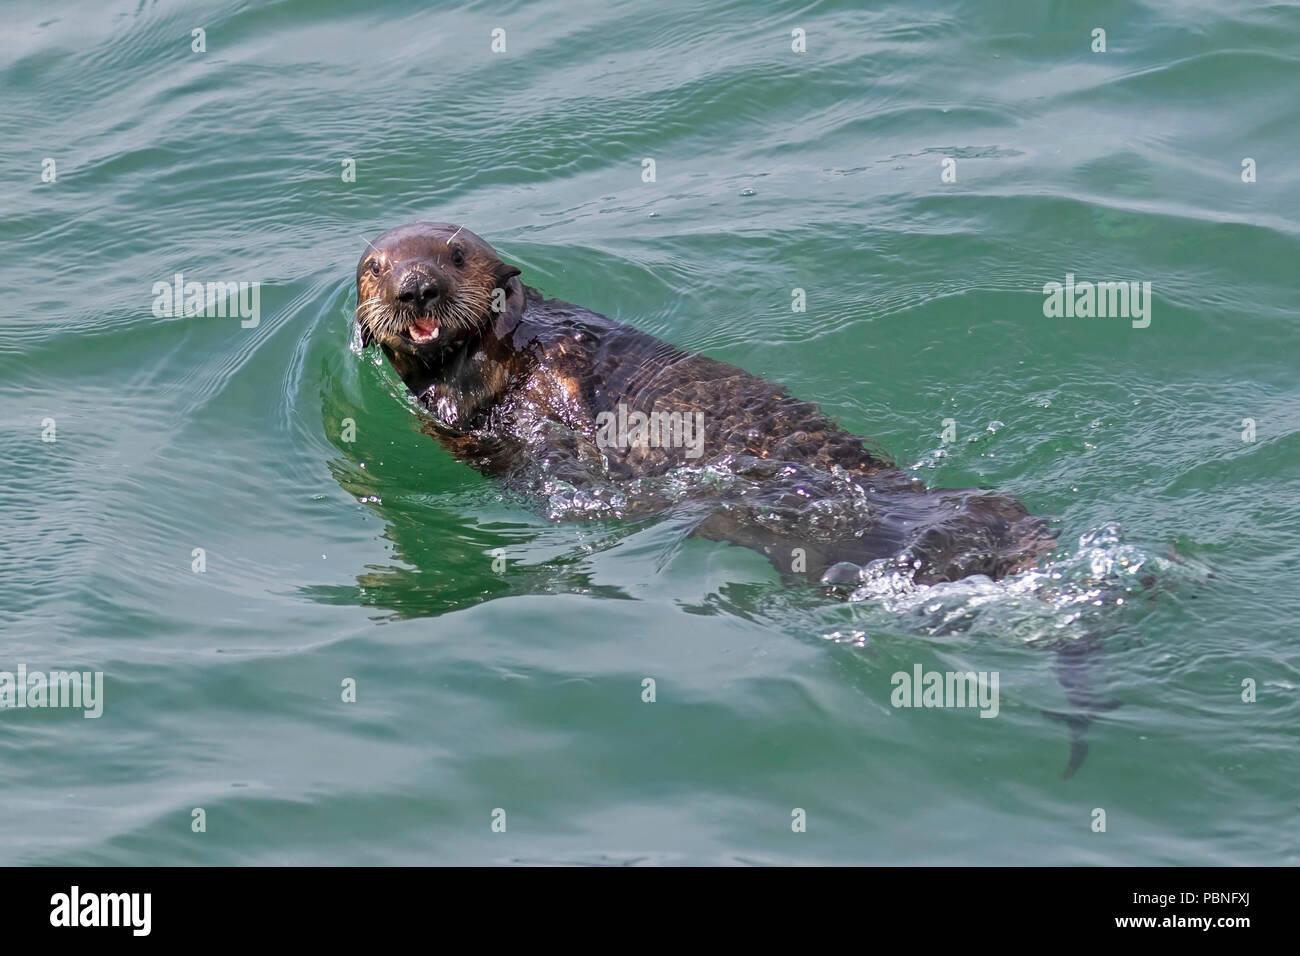 Sea otter at Moss Landing State Beach - Stock Image